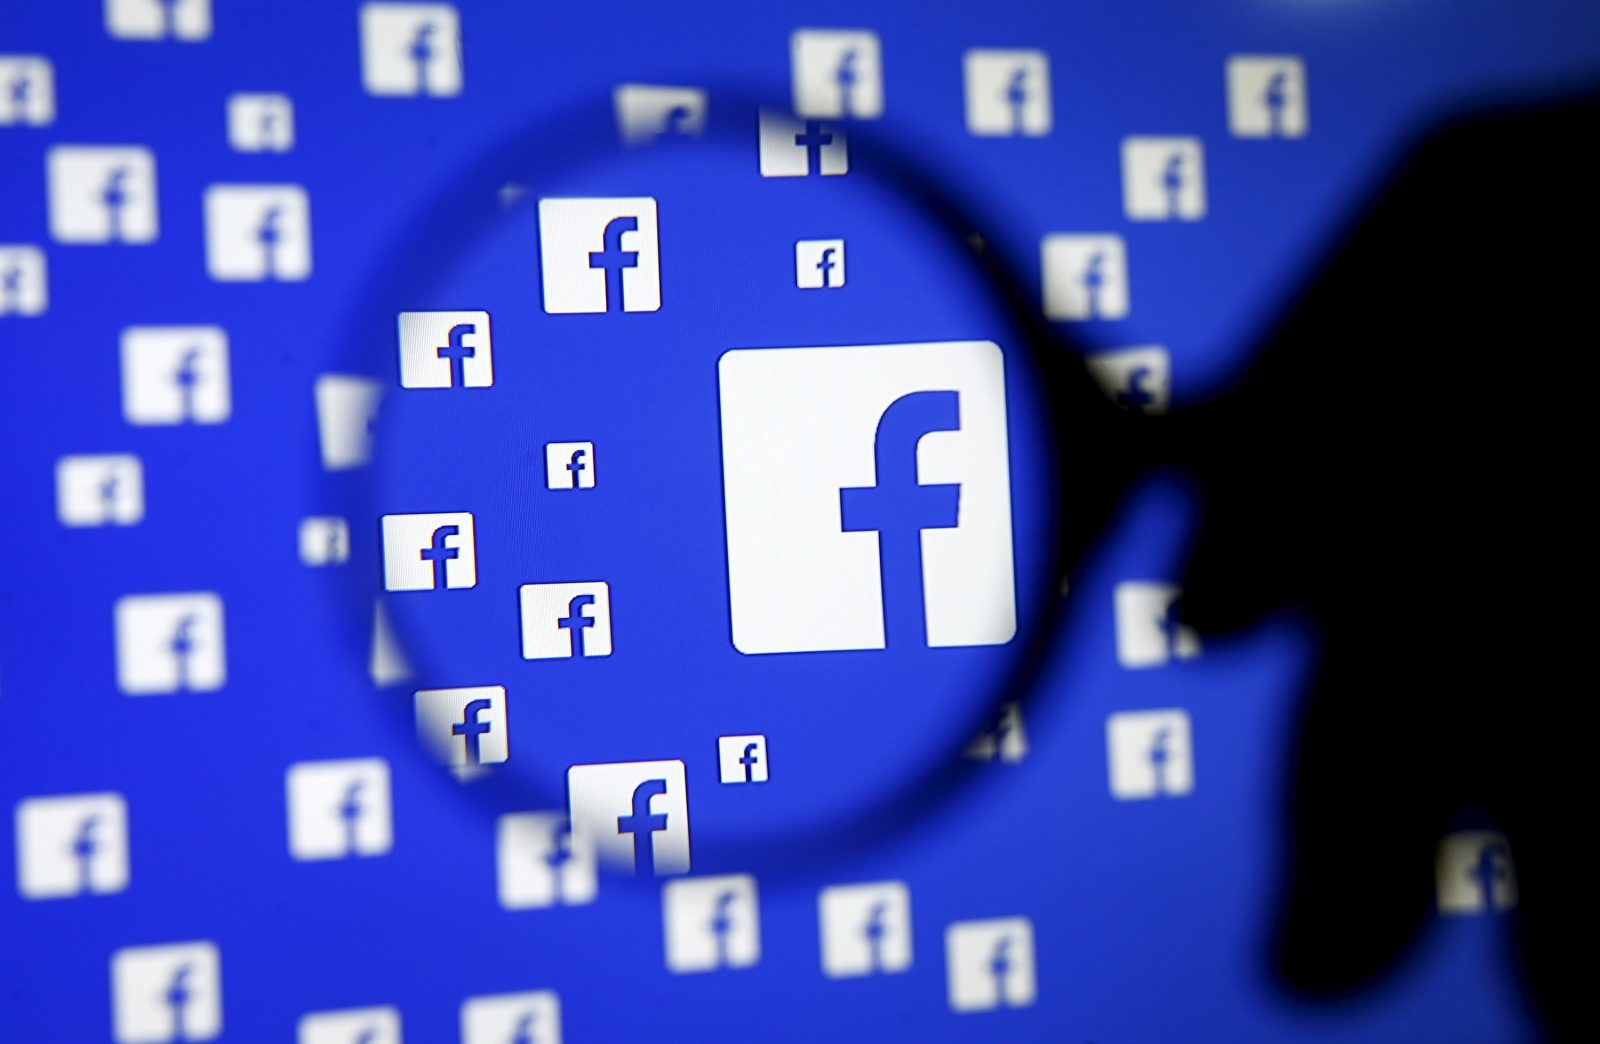 Facebook fake news detecting plug-in blocked by Facebook